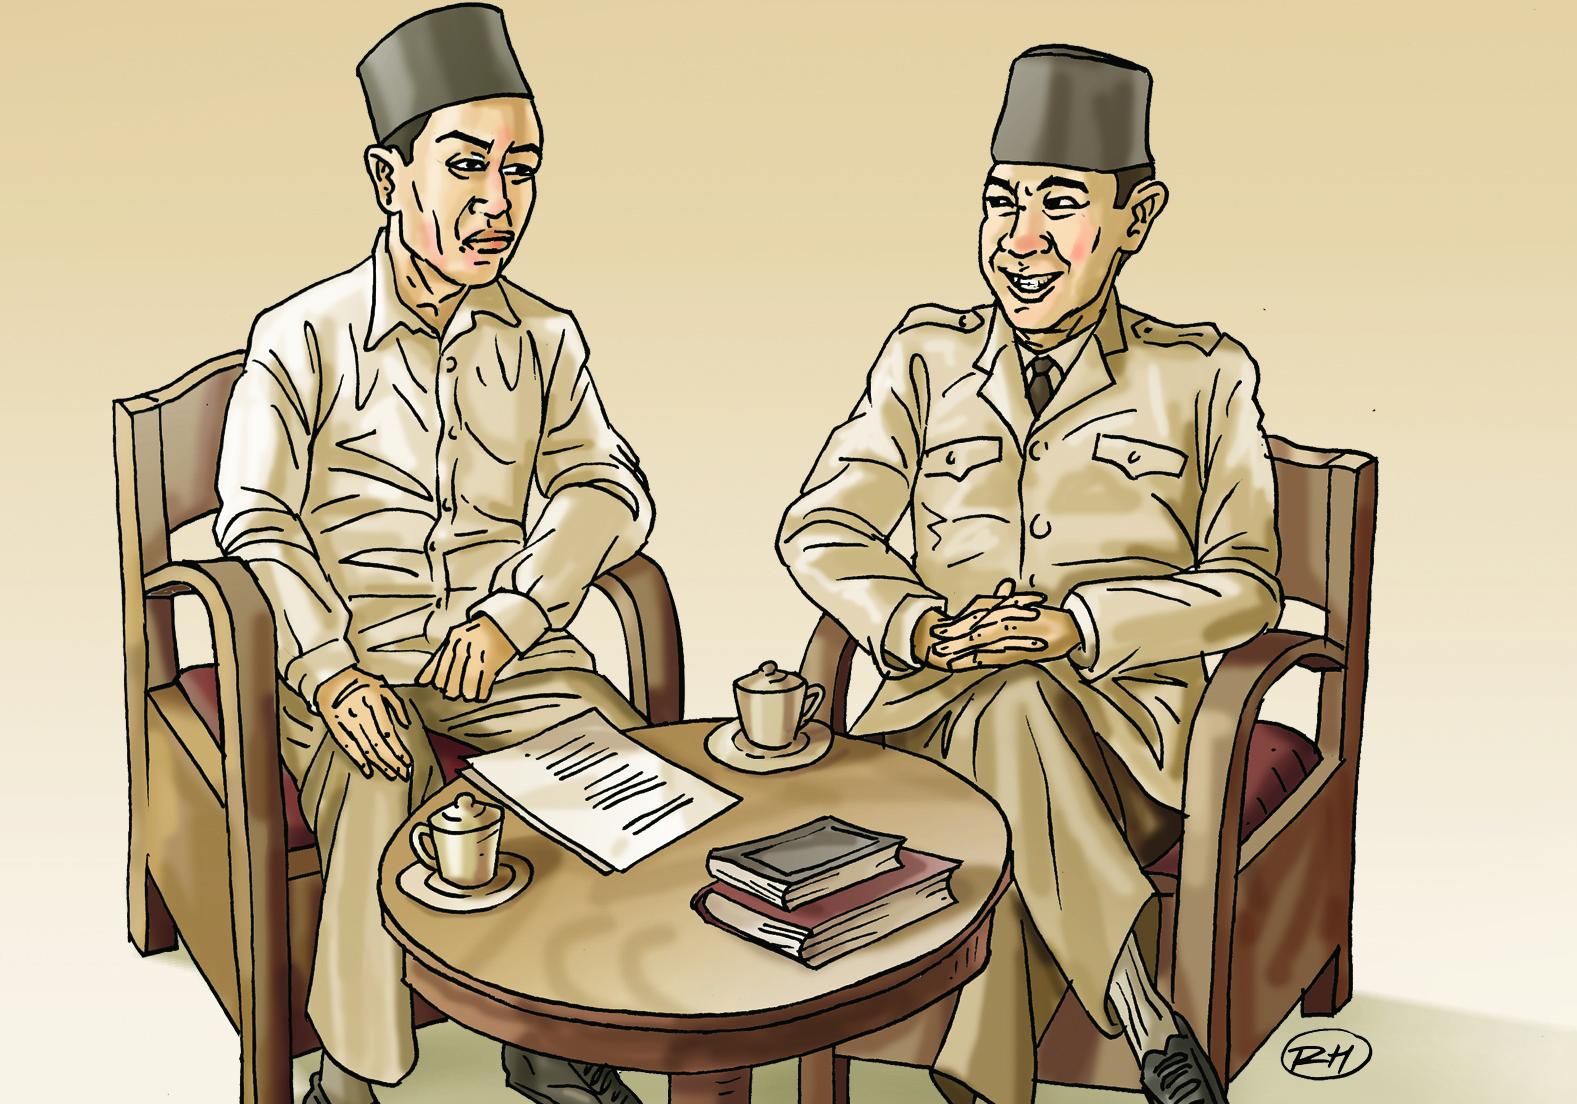 Kedekatan Bung Karno dengan KH Mas Mansur (ilustrasi: rehad humala)